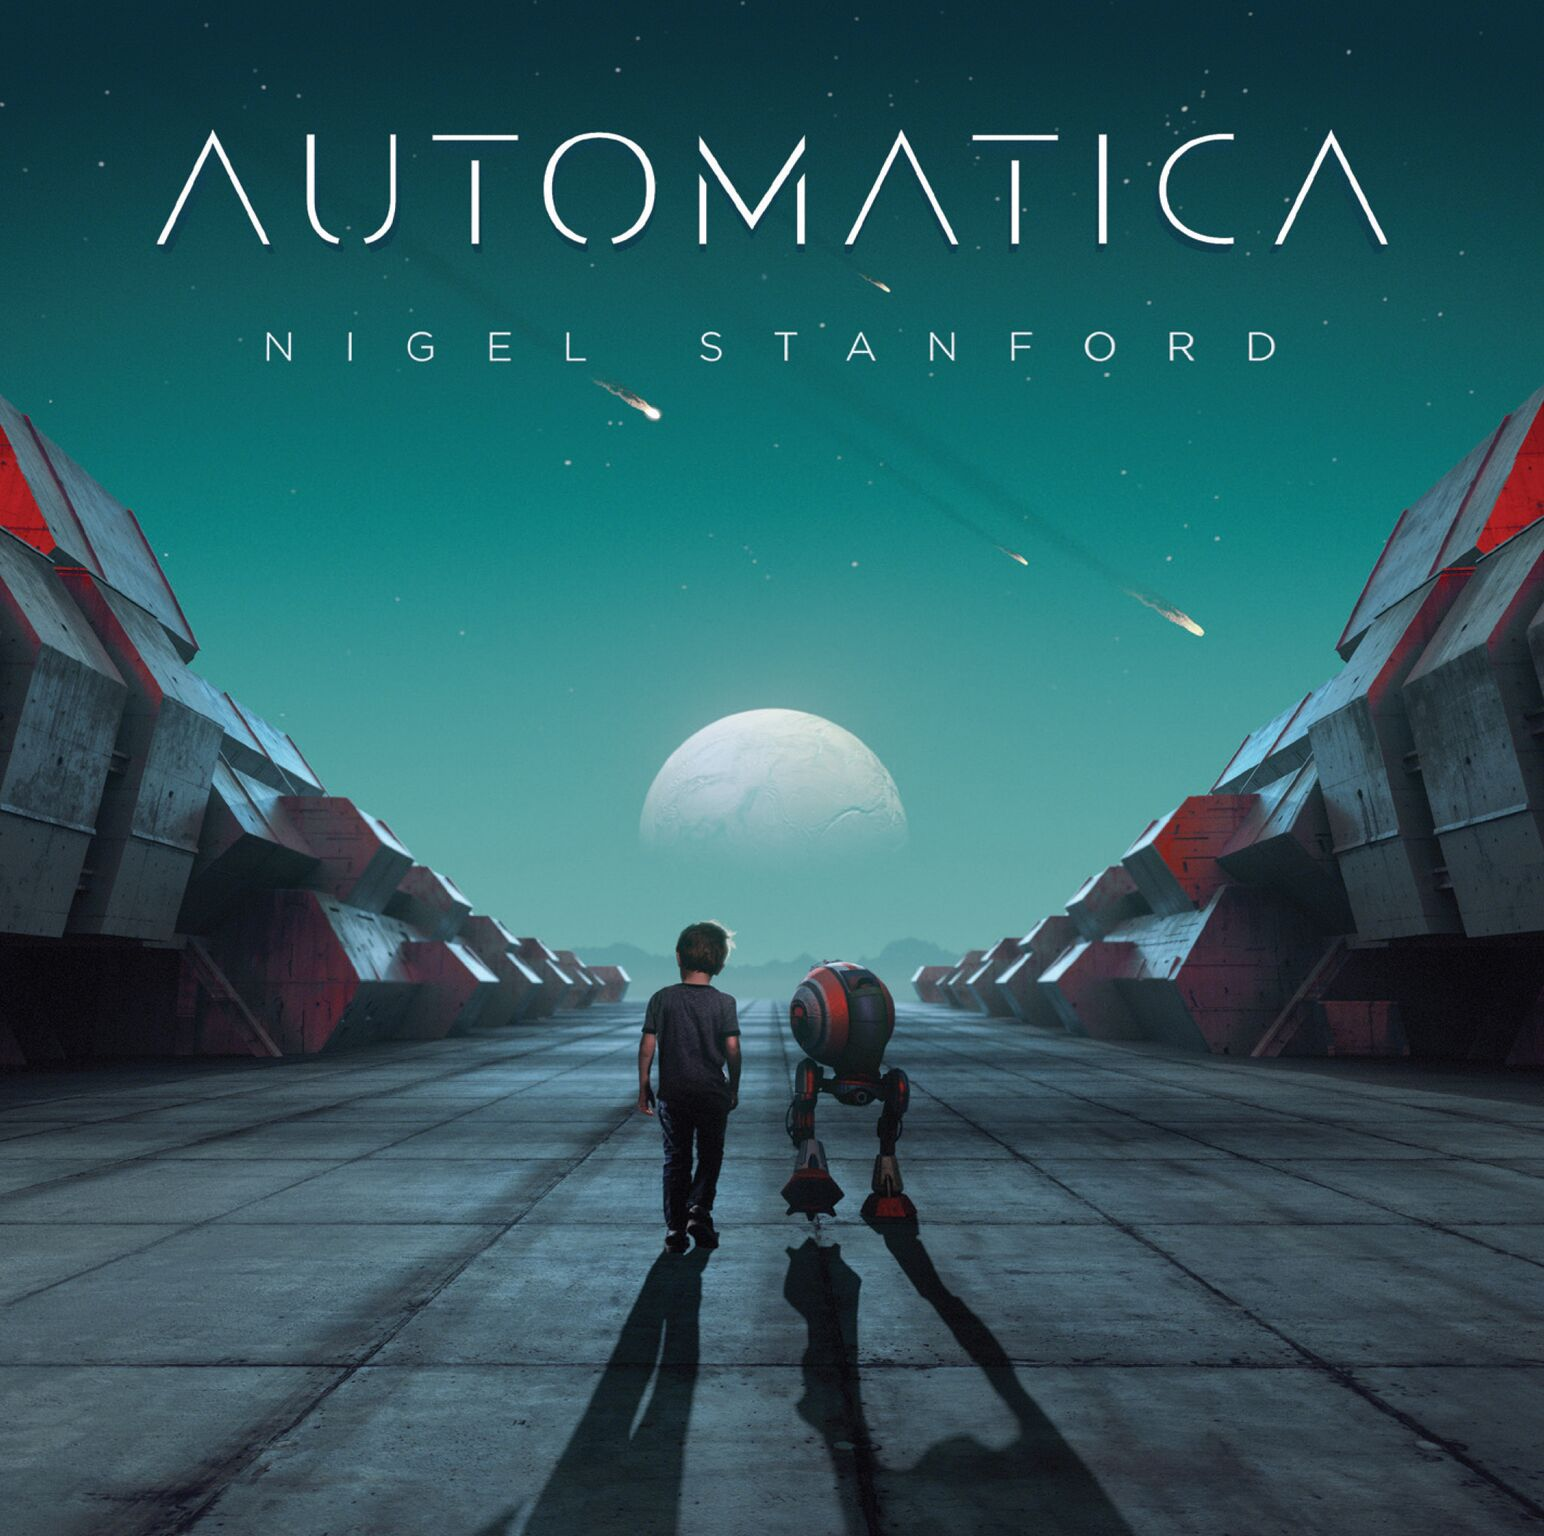 Nigel Stanford-Visual Atelier 8-Interview-4.jpeg